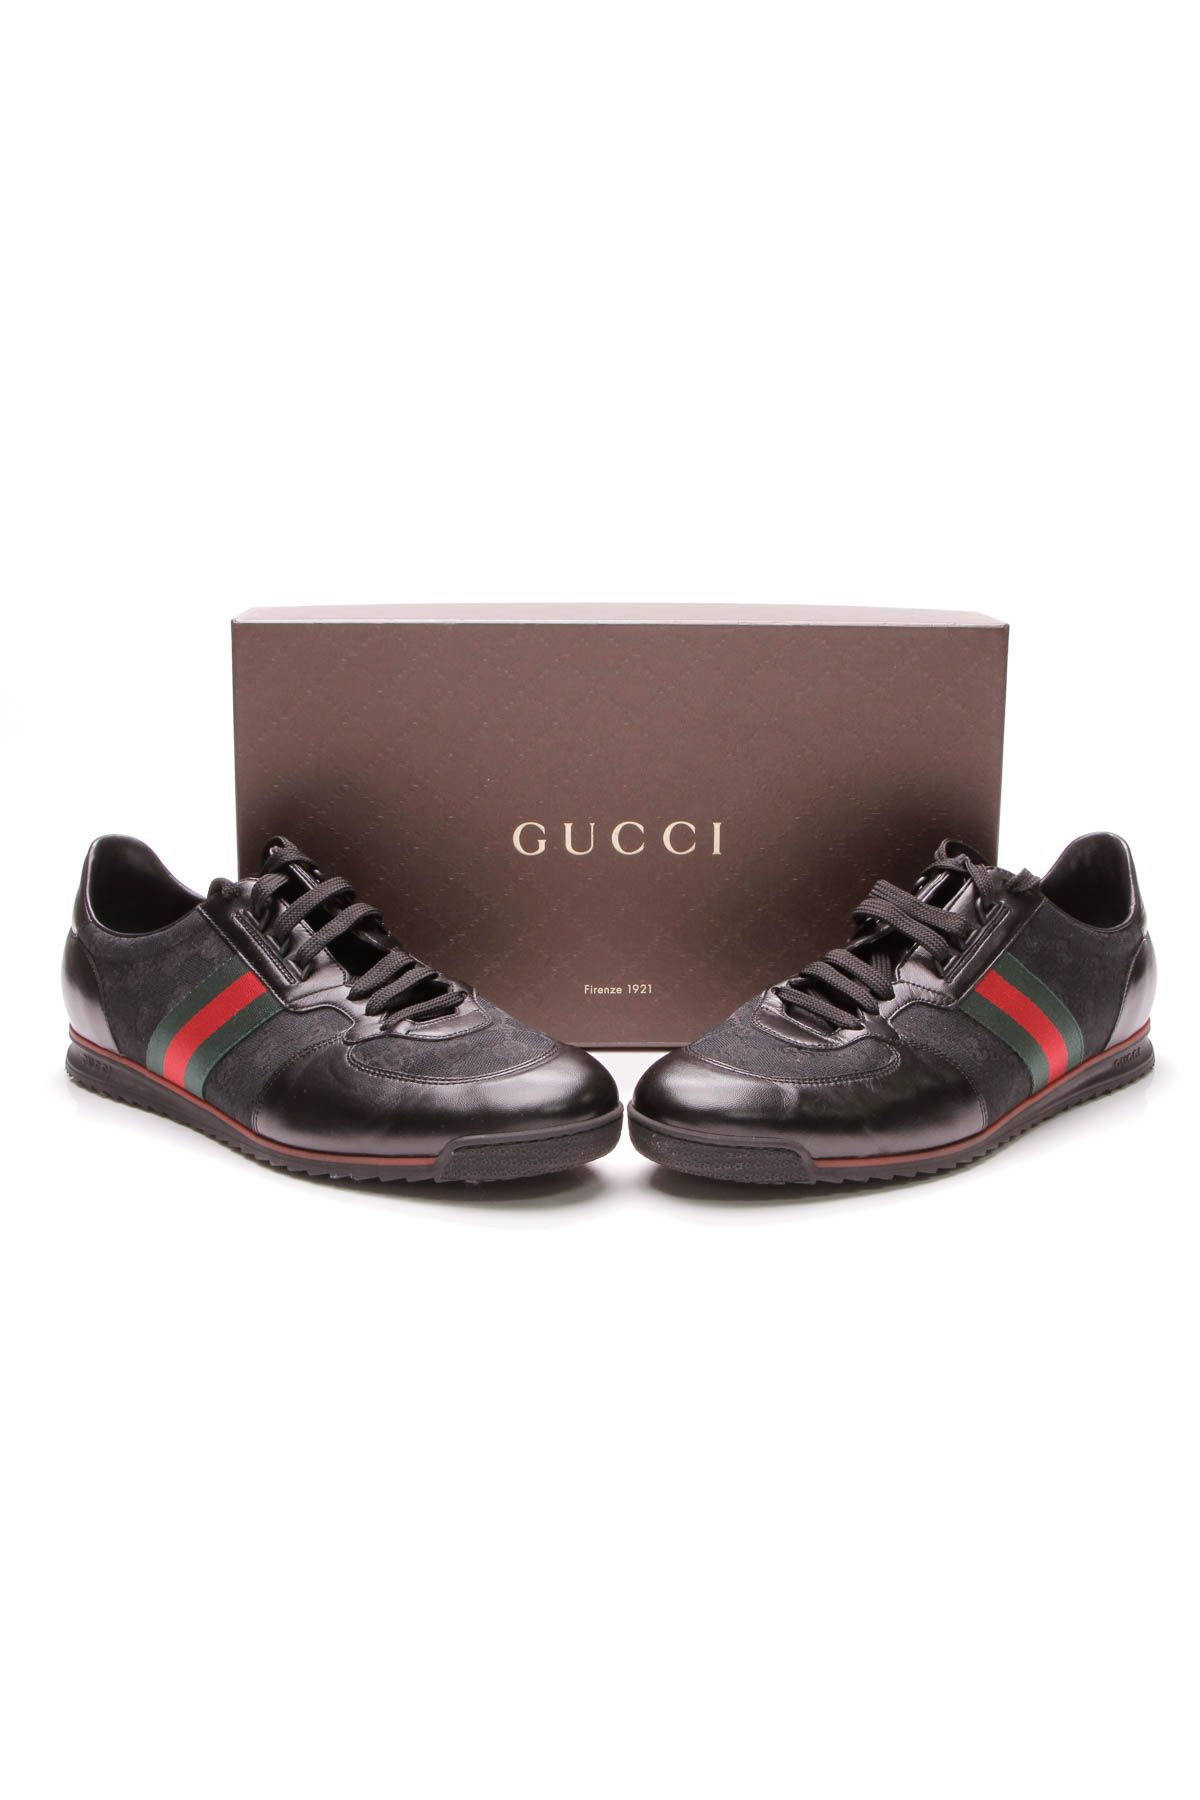 4ab24fc6d30 Gucci SL73 Web Men s Sneakers - Black GG Canvas